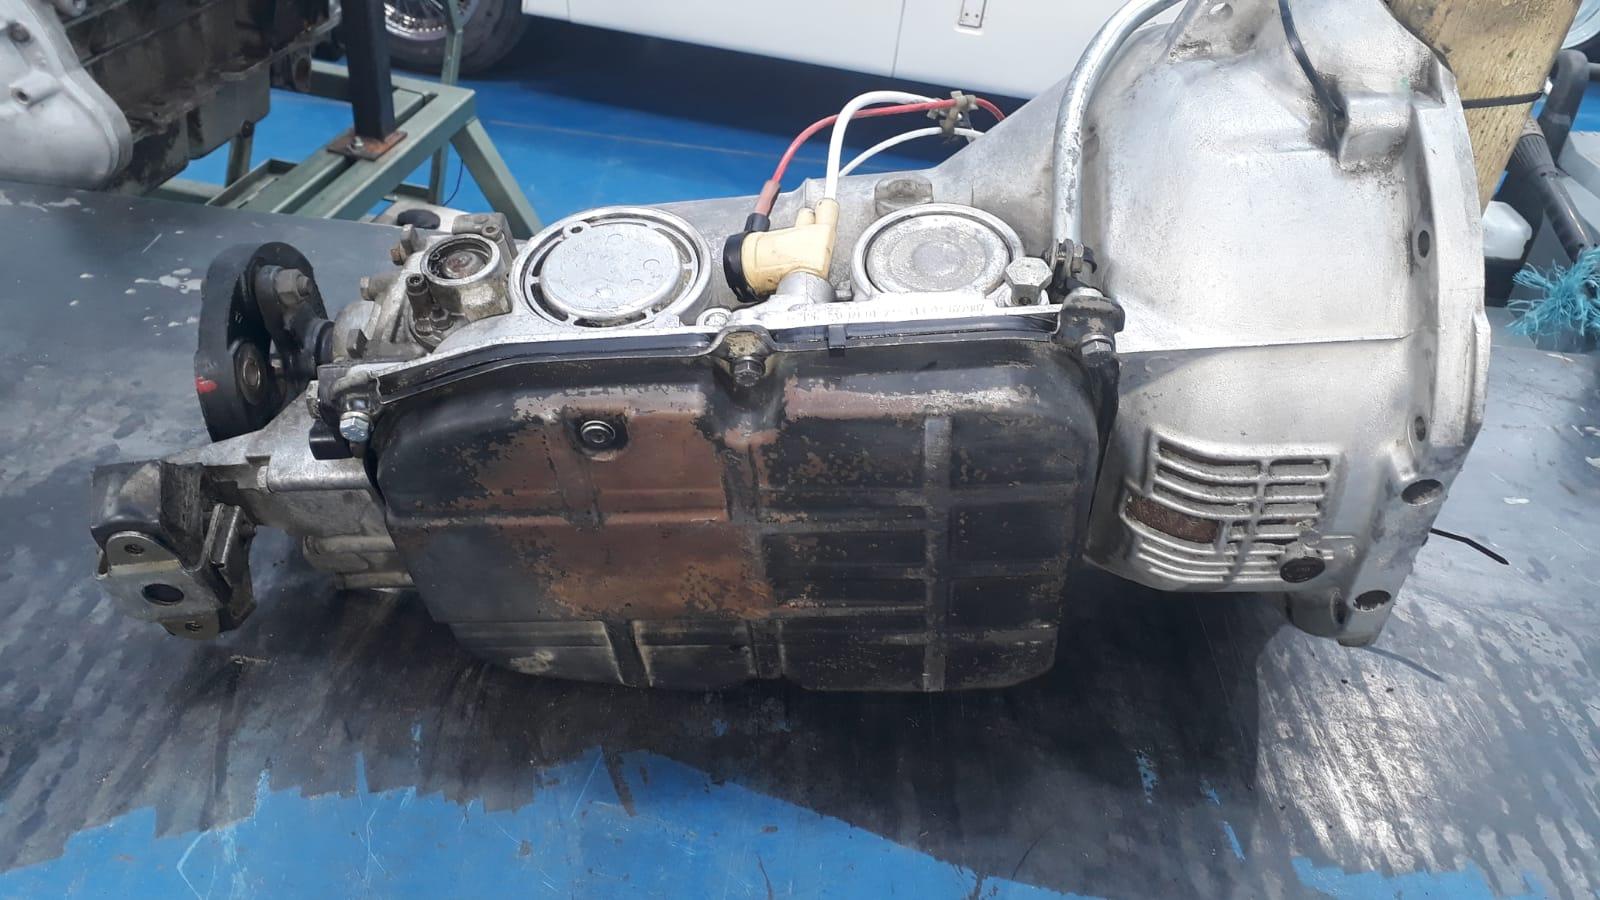 Refurbishing our SL500 gearbox